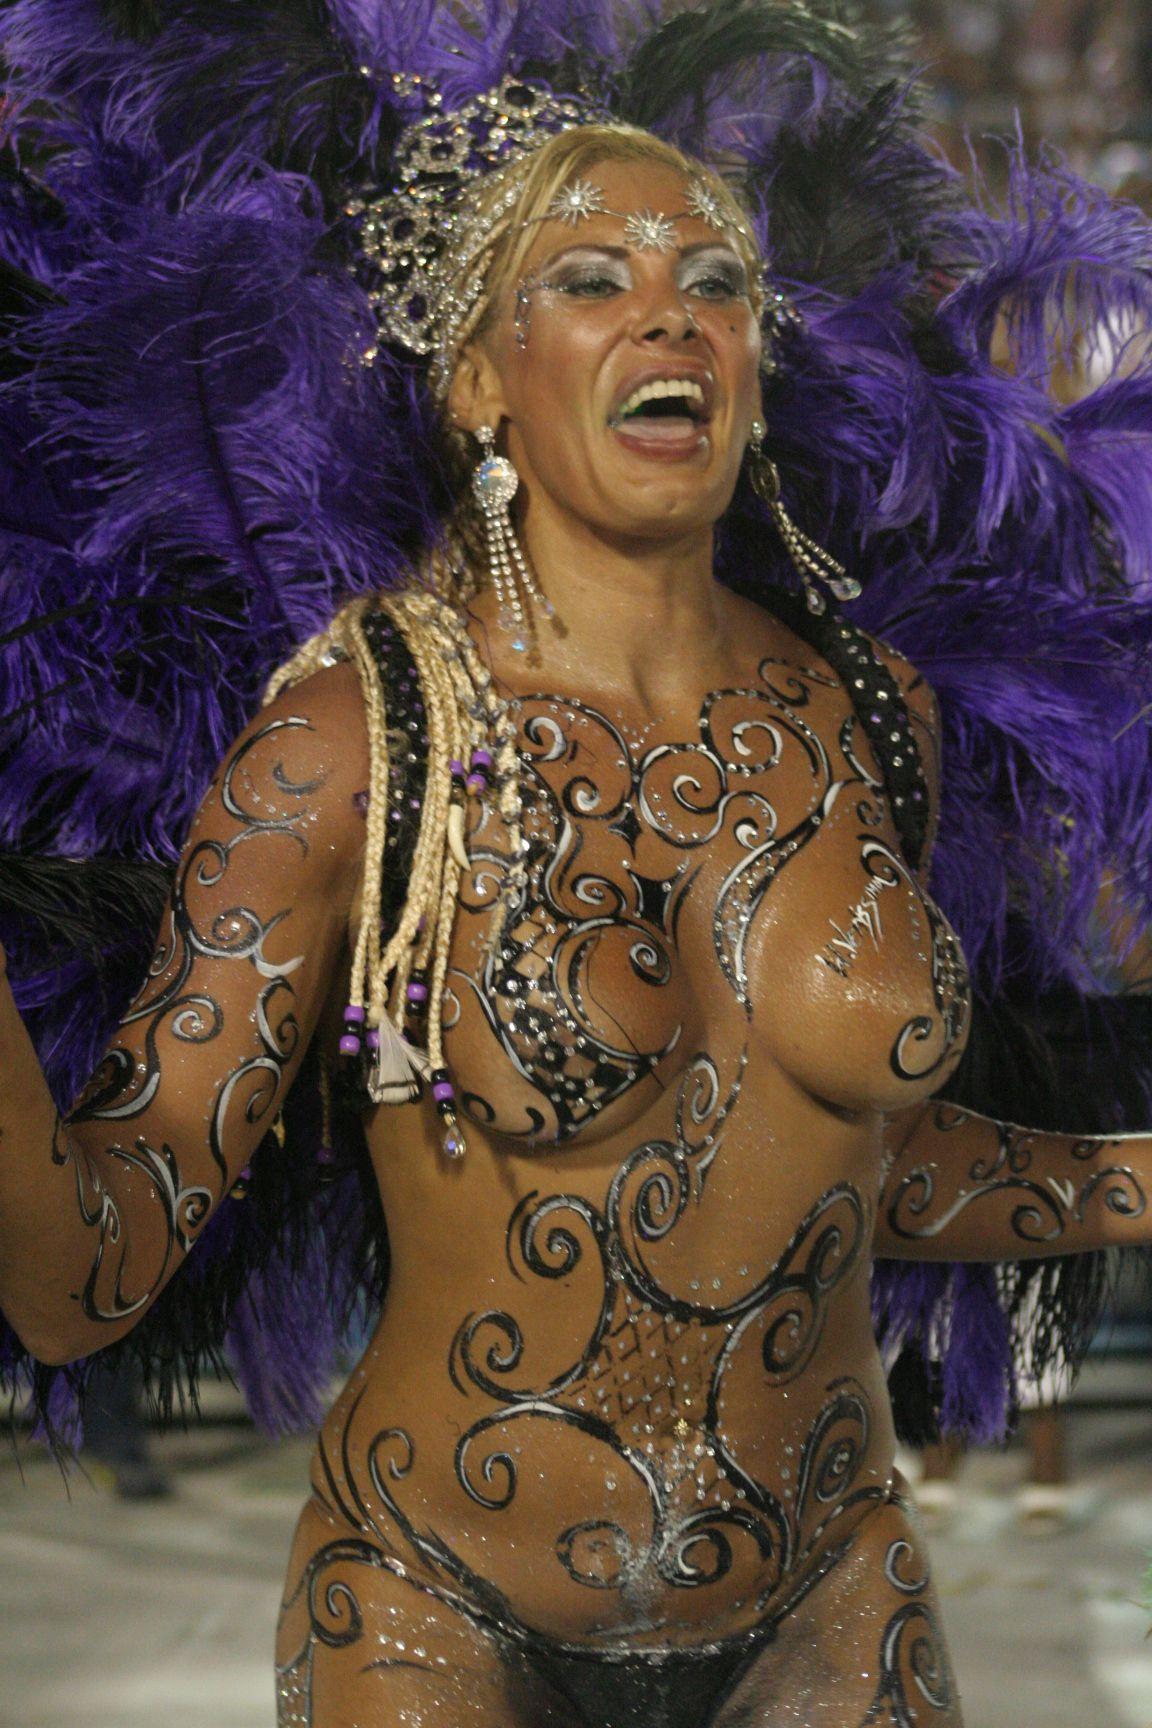 Ххх бразильский карнавал